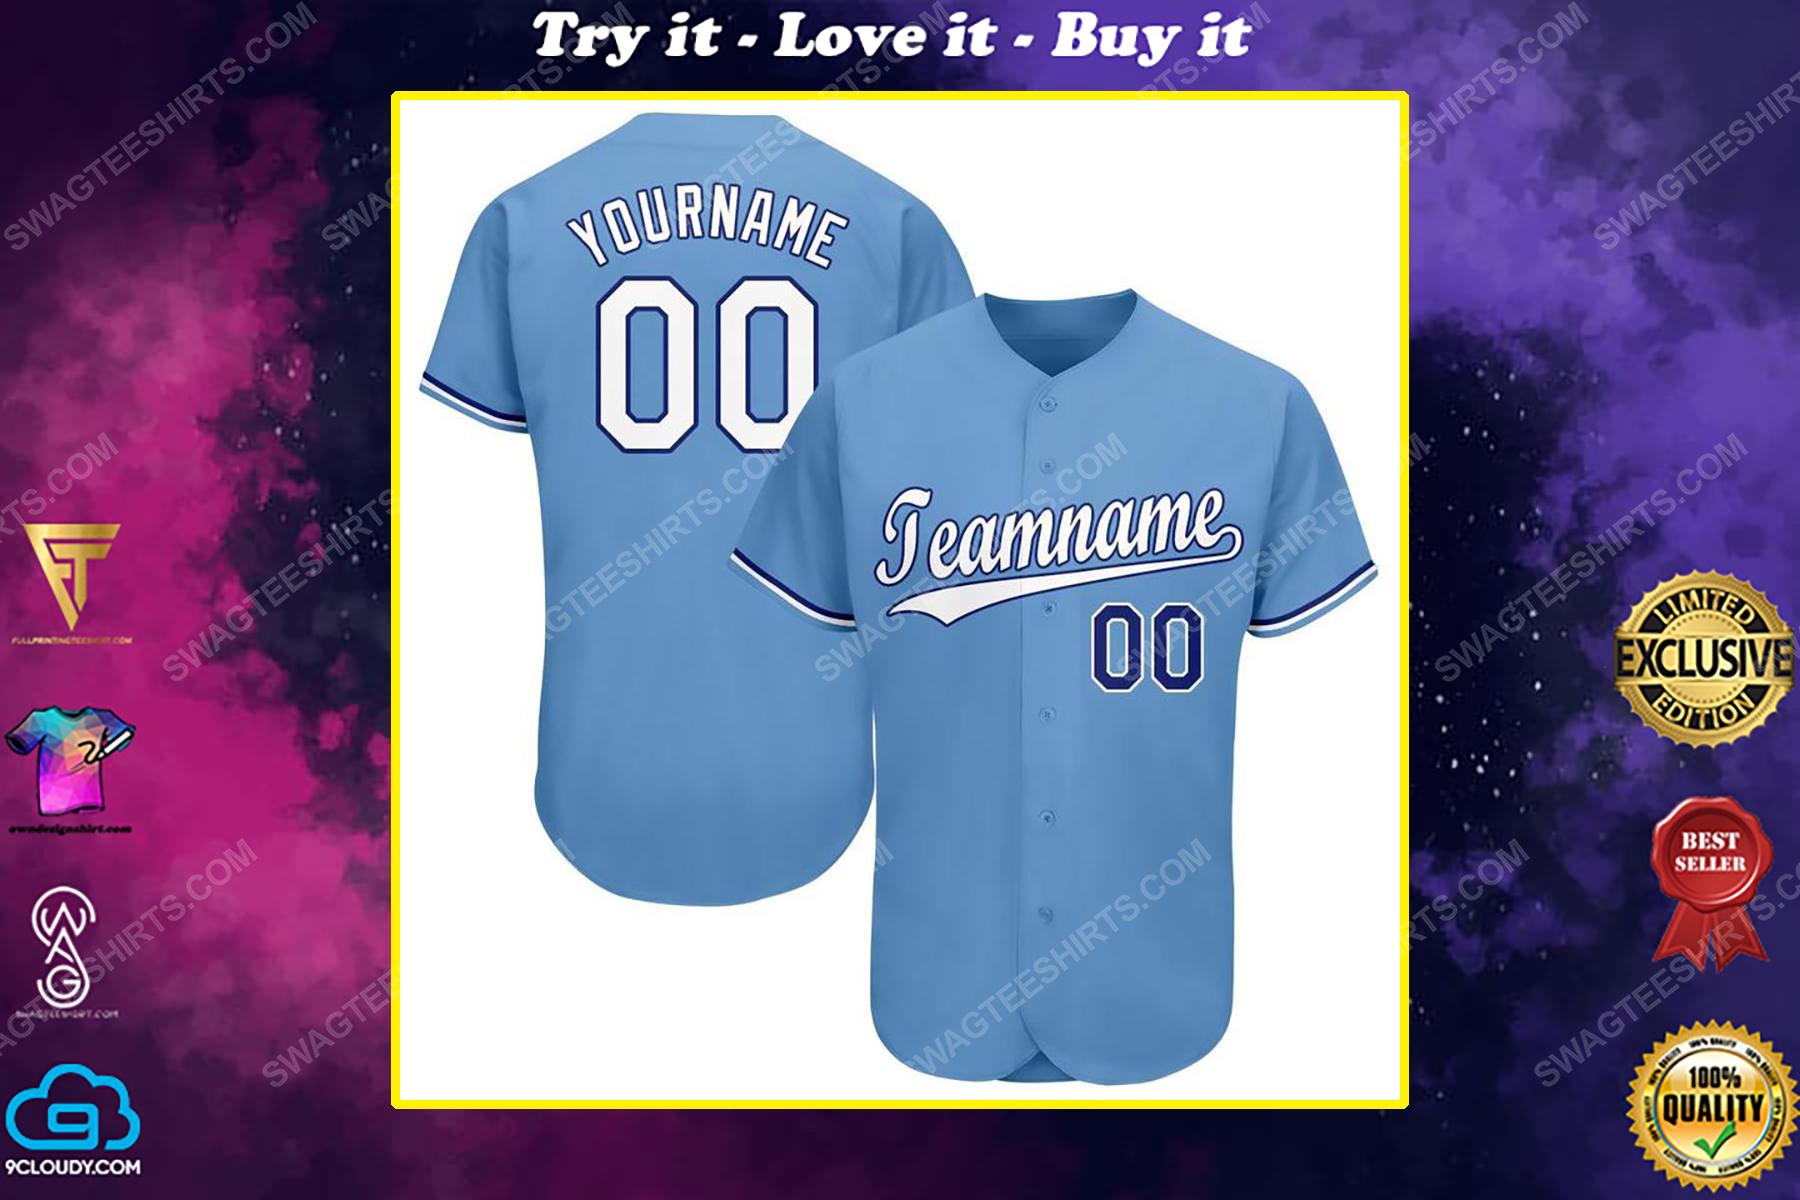 Custom team name kansas city royals mlb full printed baseball jersey